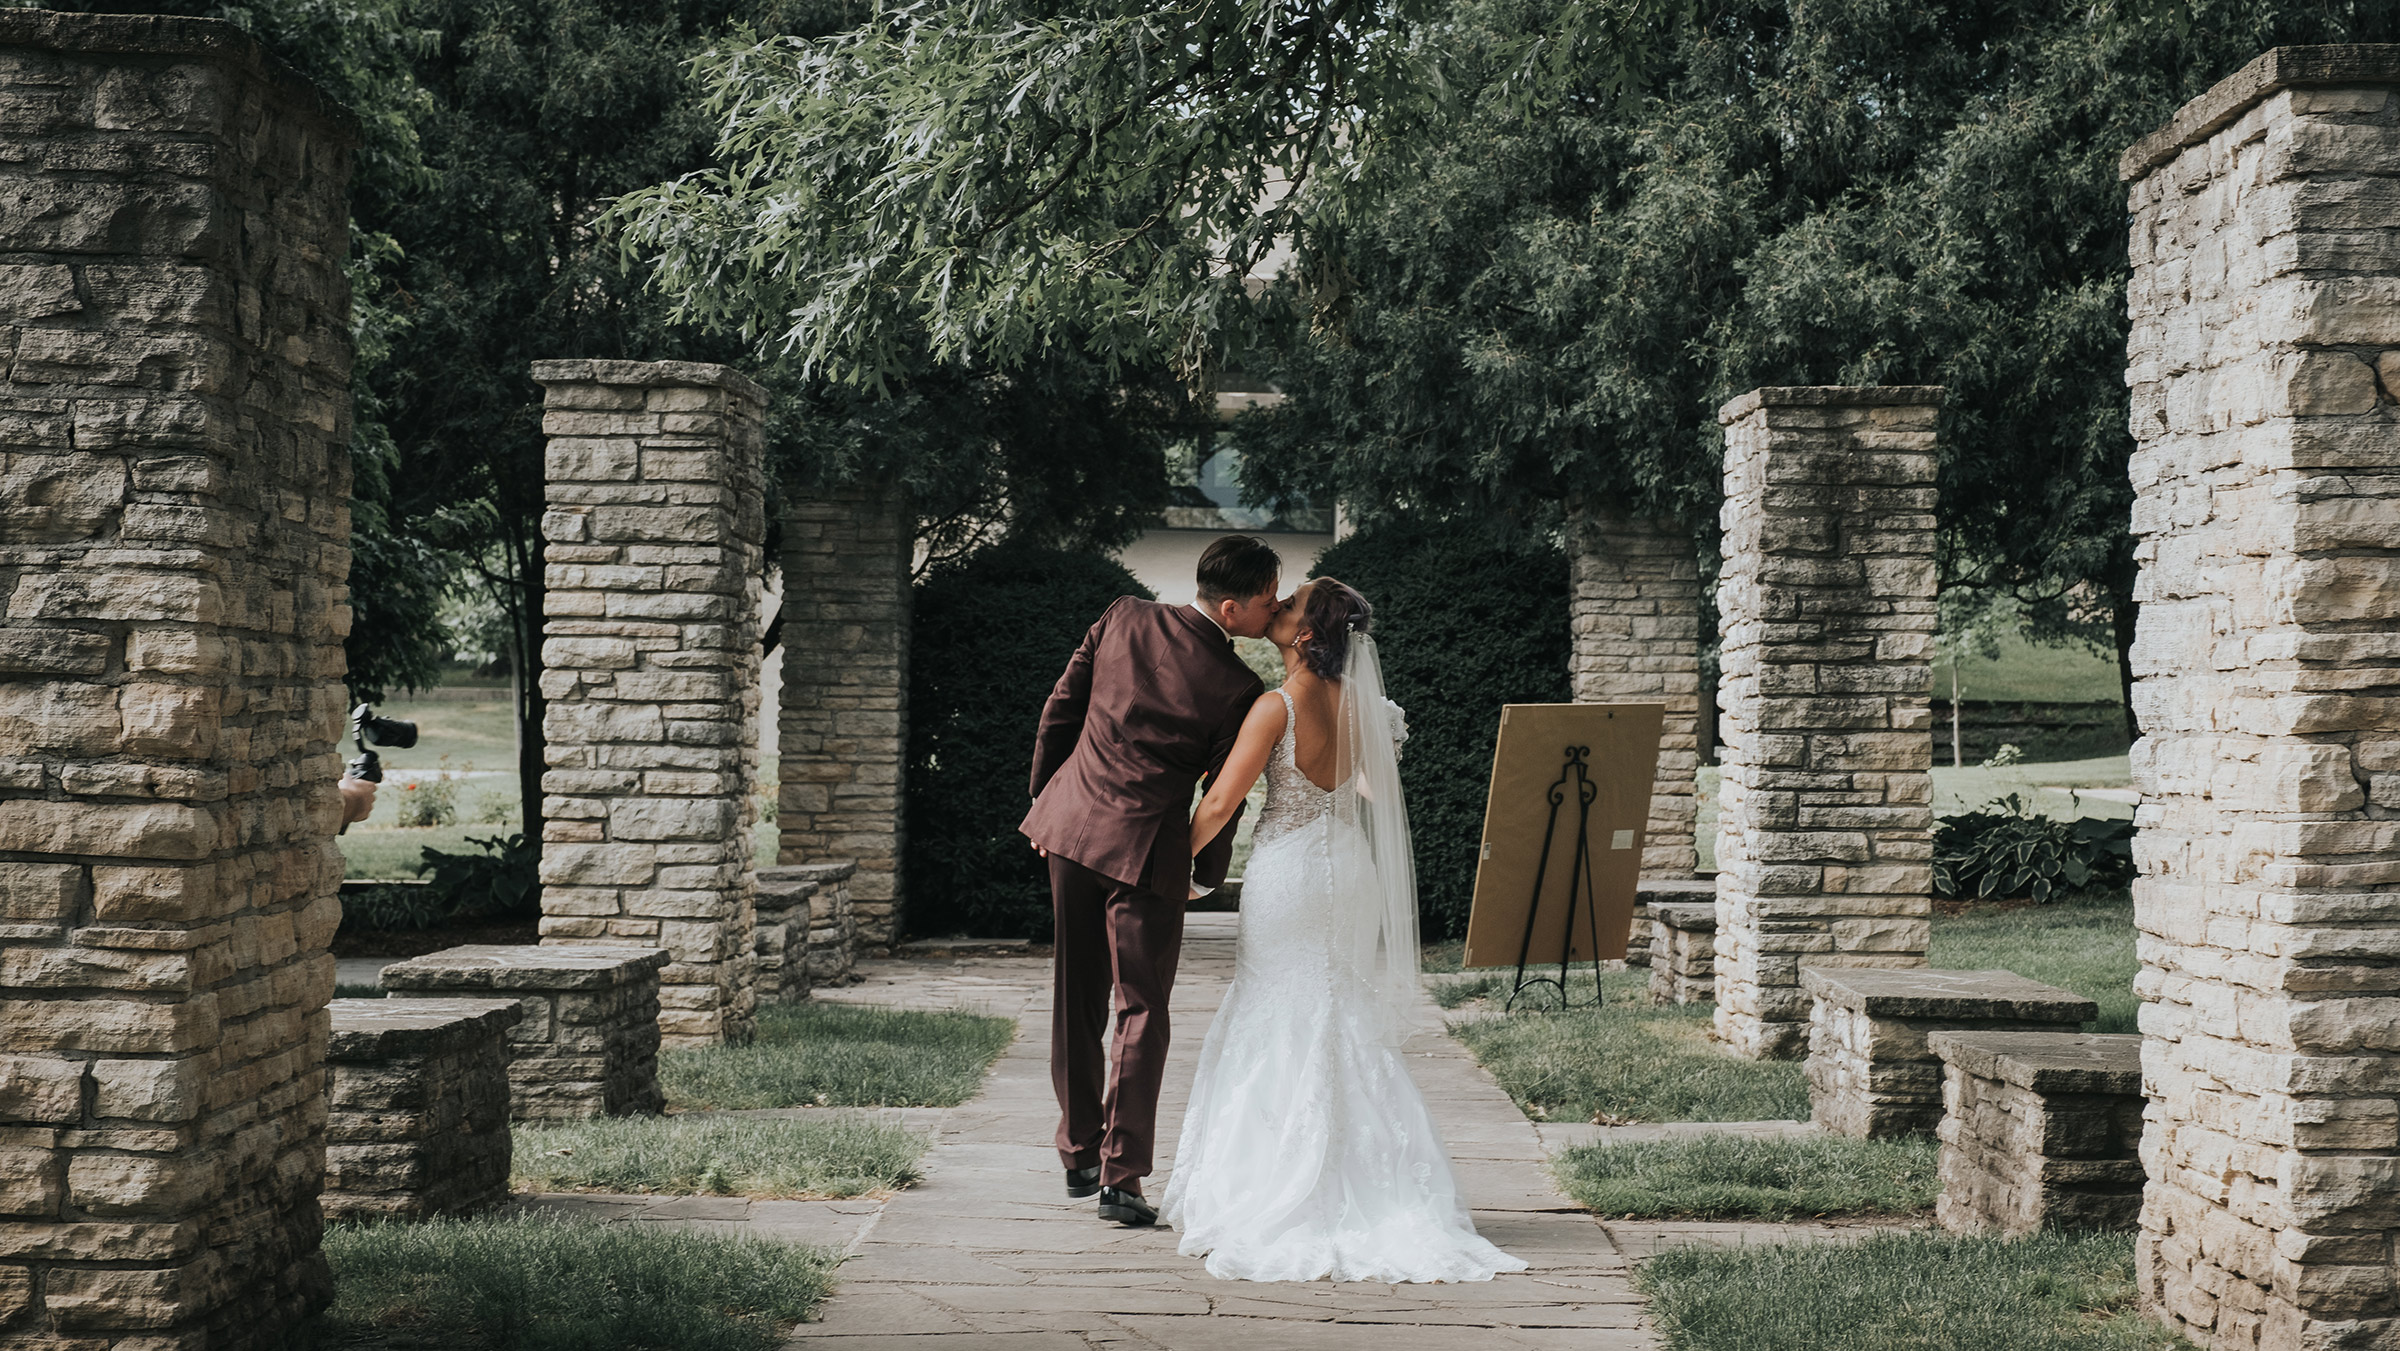 wedding-couple-kissing-at-end-of-aisle-desmoines-iowa-rose-garden-raelyn-ramey-photography.jpg